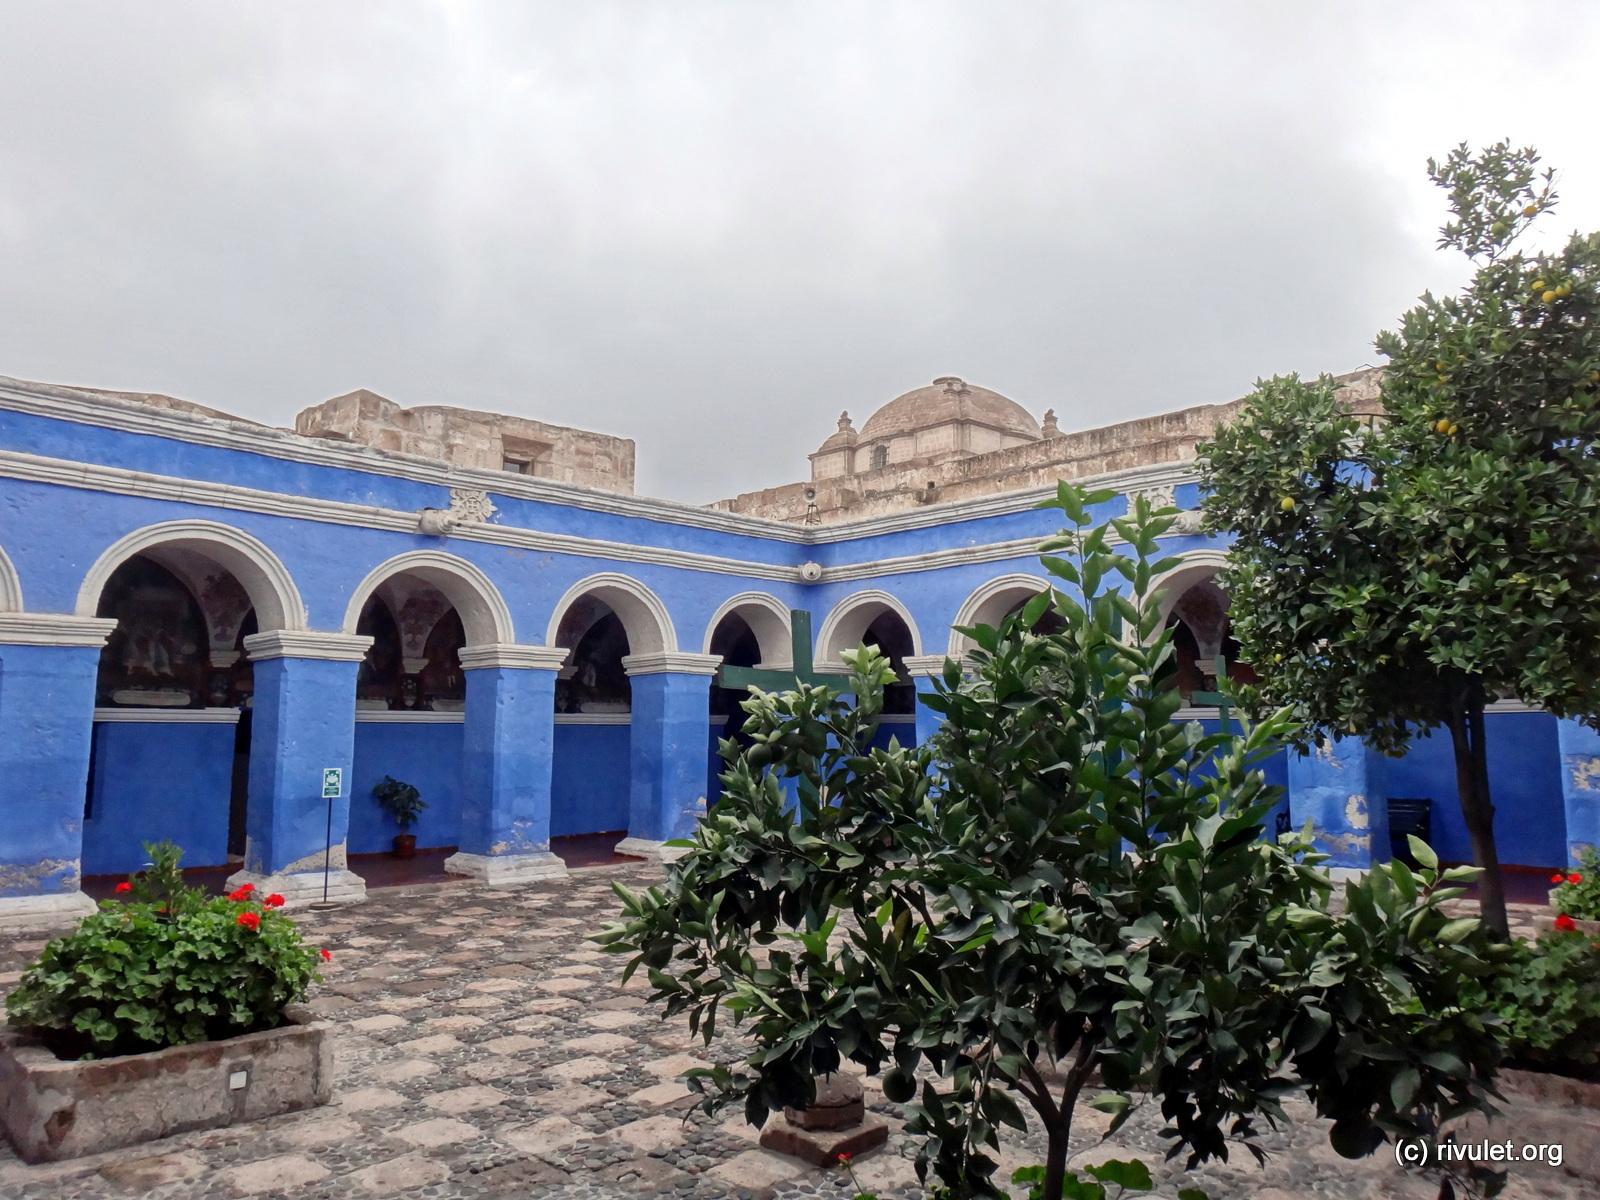 A blue courtyard.